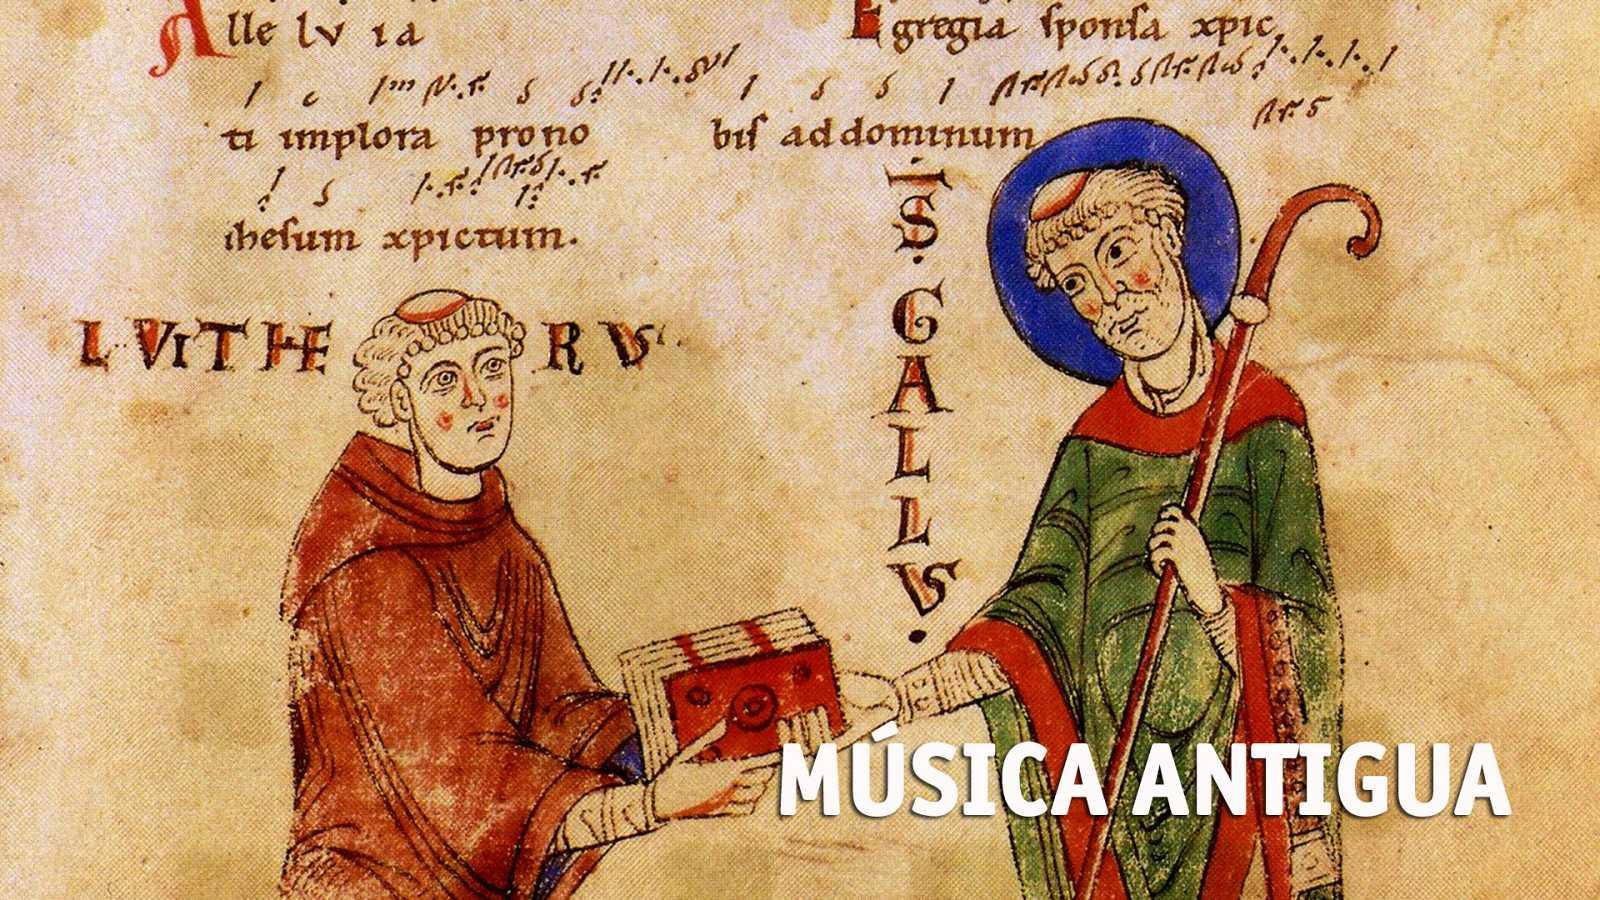 Música antigua - Benignísima Majestad... - 16/01/18 - escuchar ahora